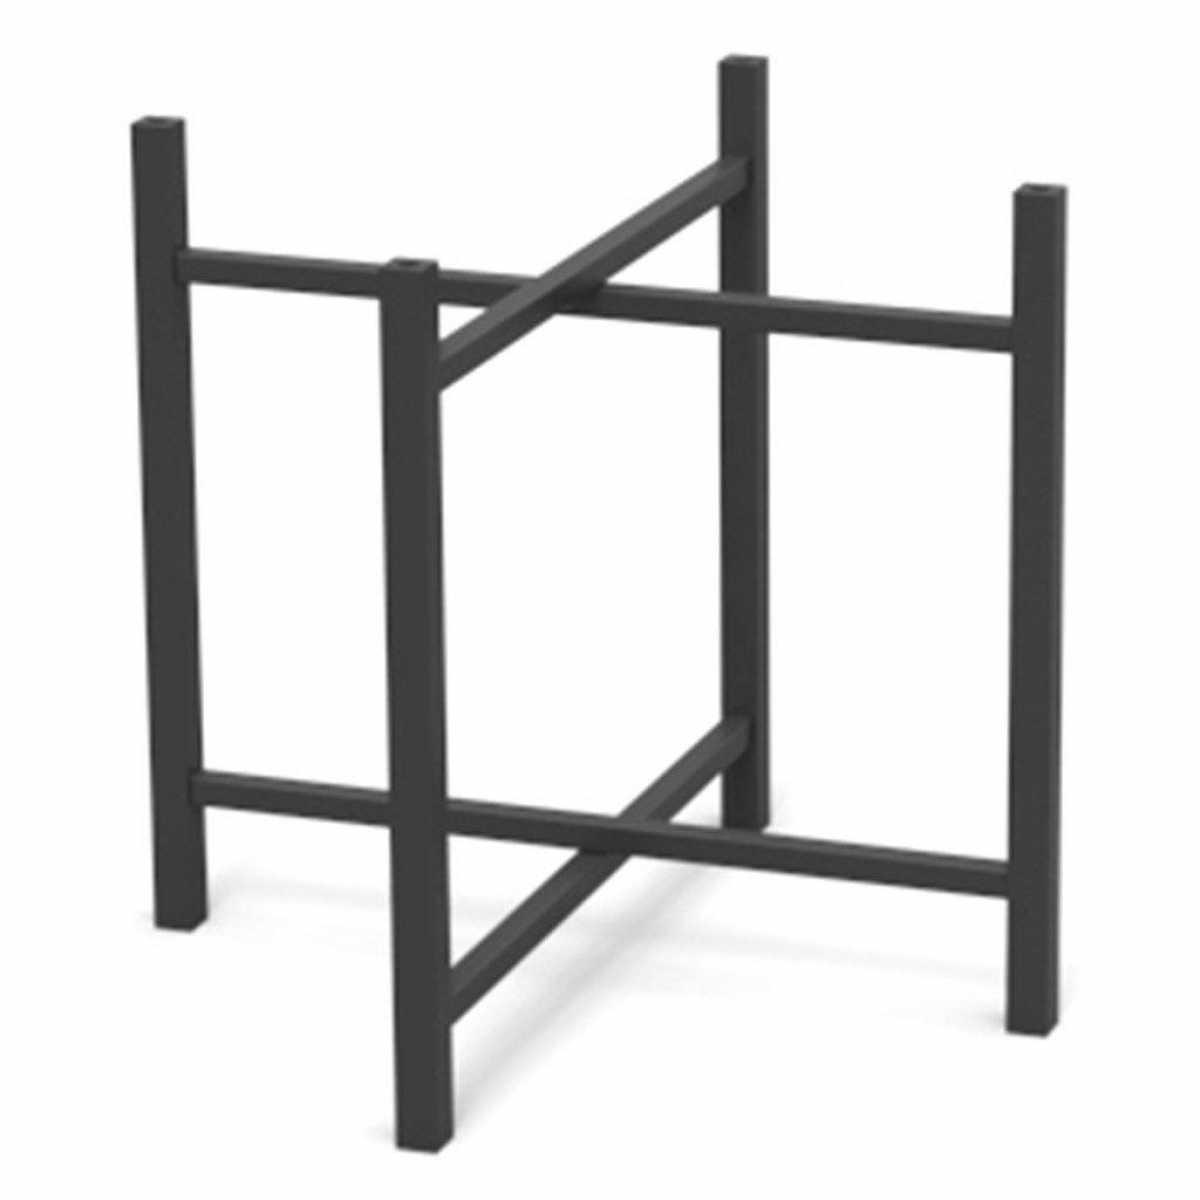 CRASTER 800 Serisi Siyah Ayak, Kısa